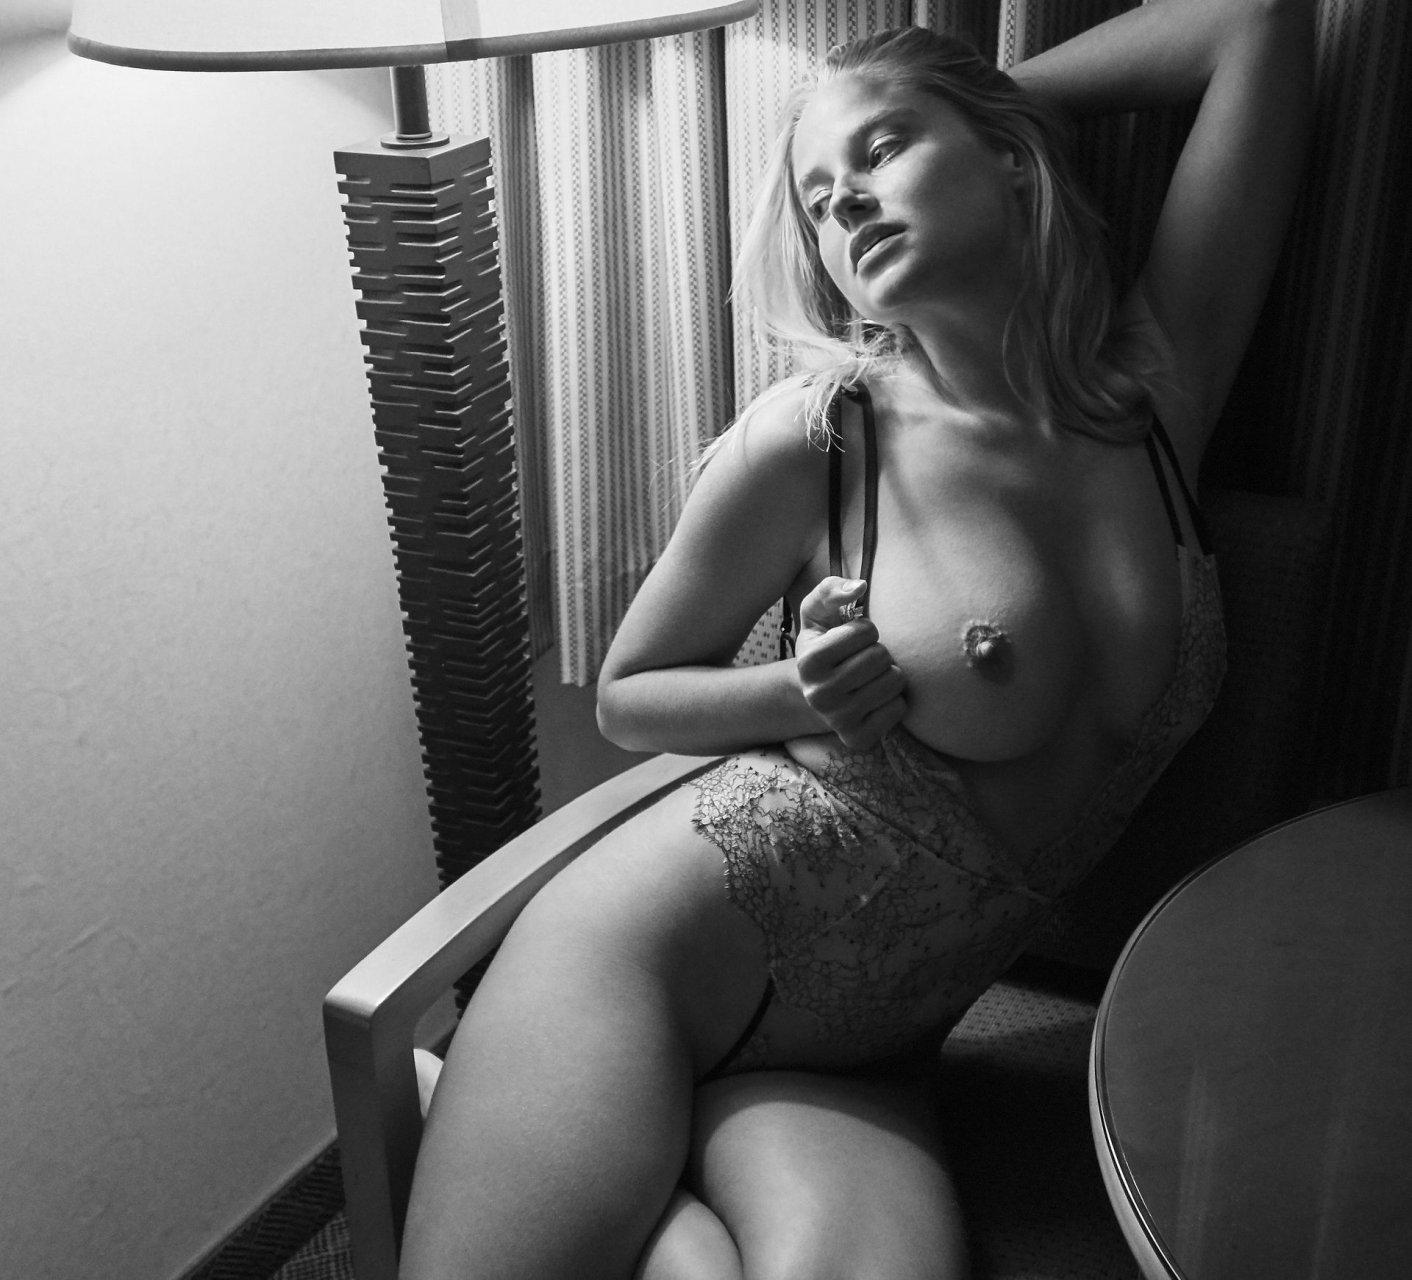 Daria savishkina 2019 pictures